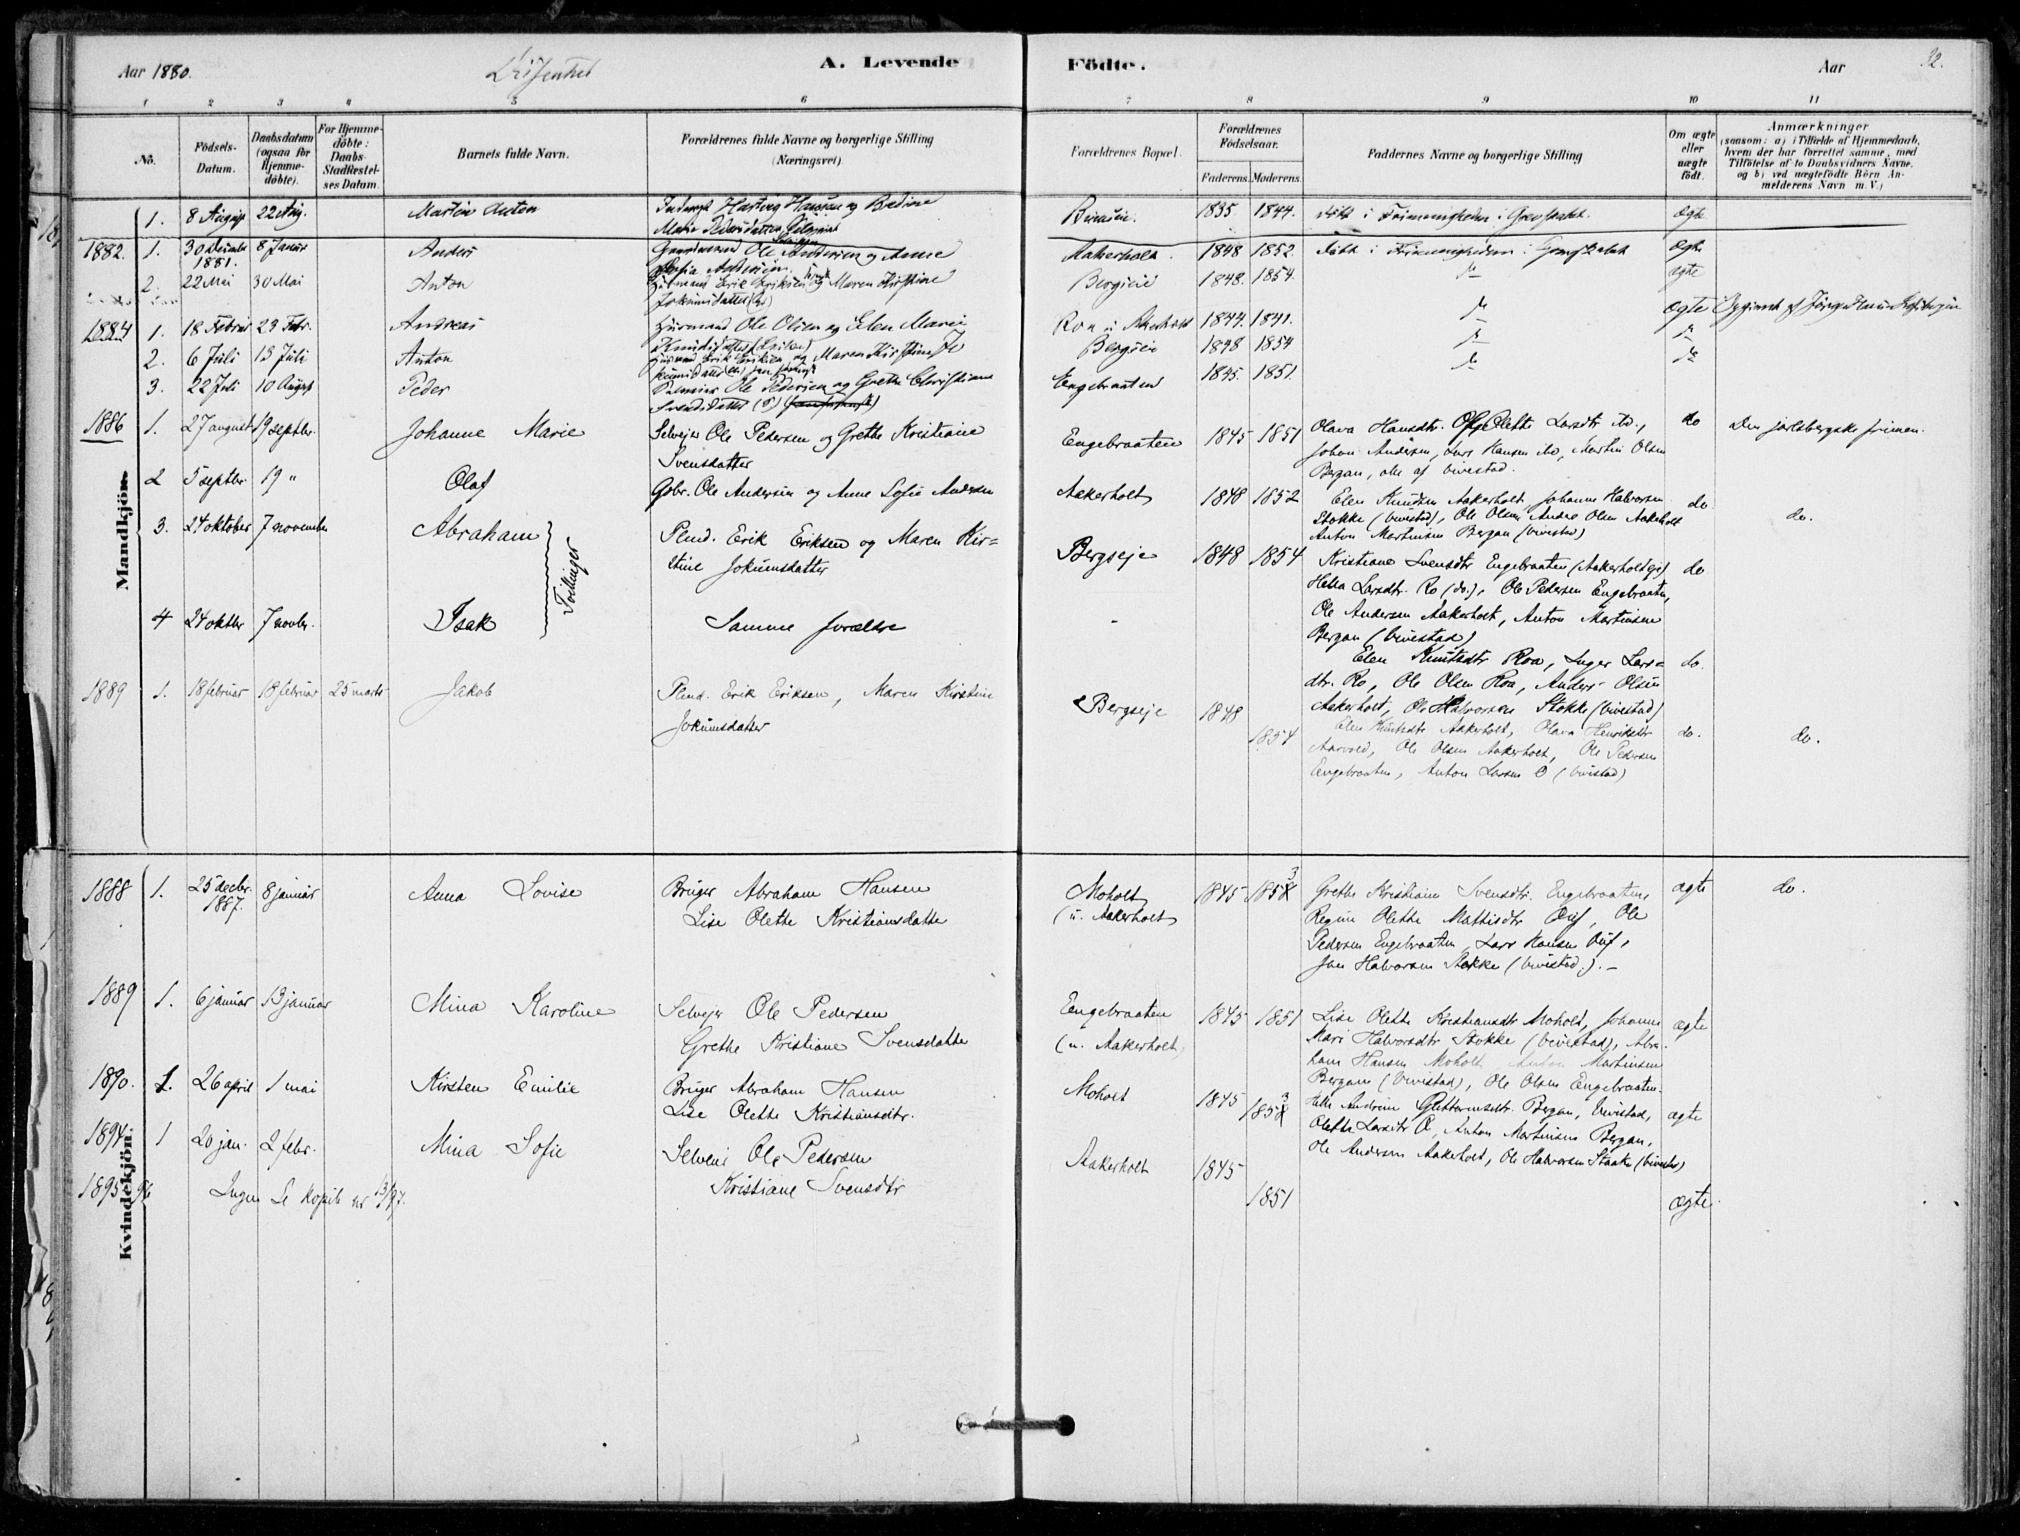 SAKO, Hof kirkebøker, F/Fb/L0001: Ministerialbok nr. II 1, 1878-1907, s. 32